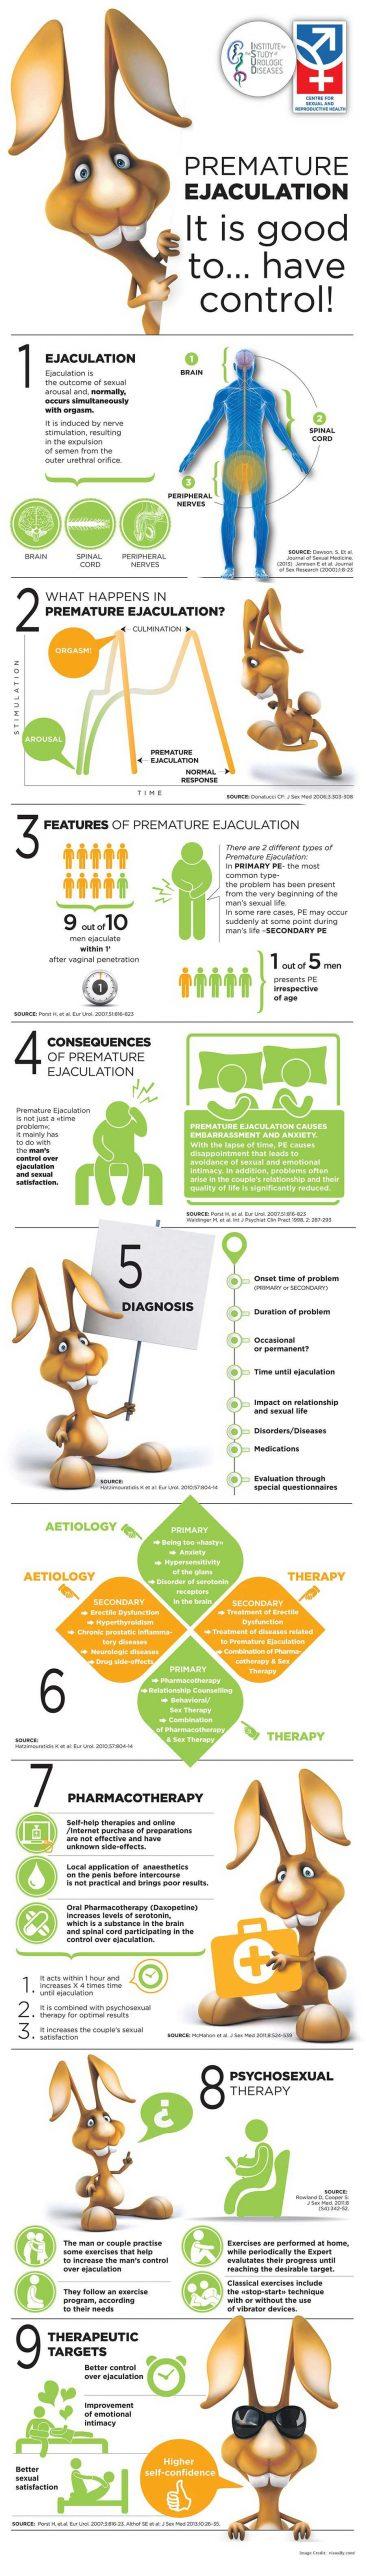 Premature Ejaculation Control Info